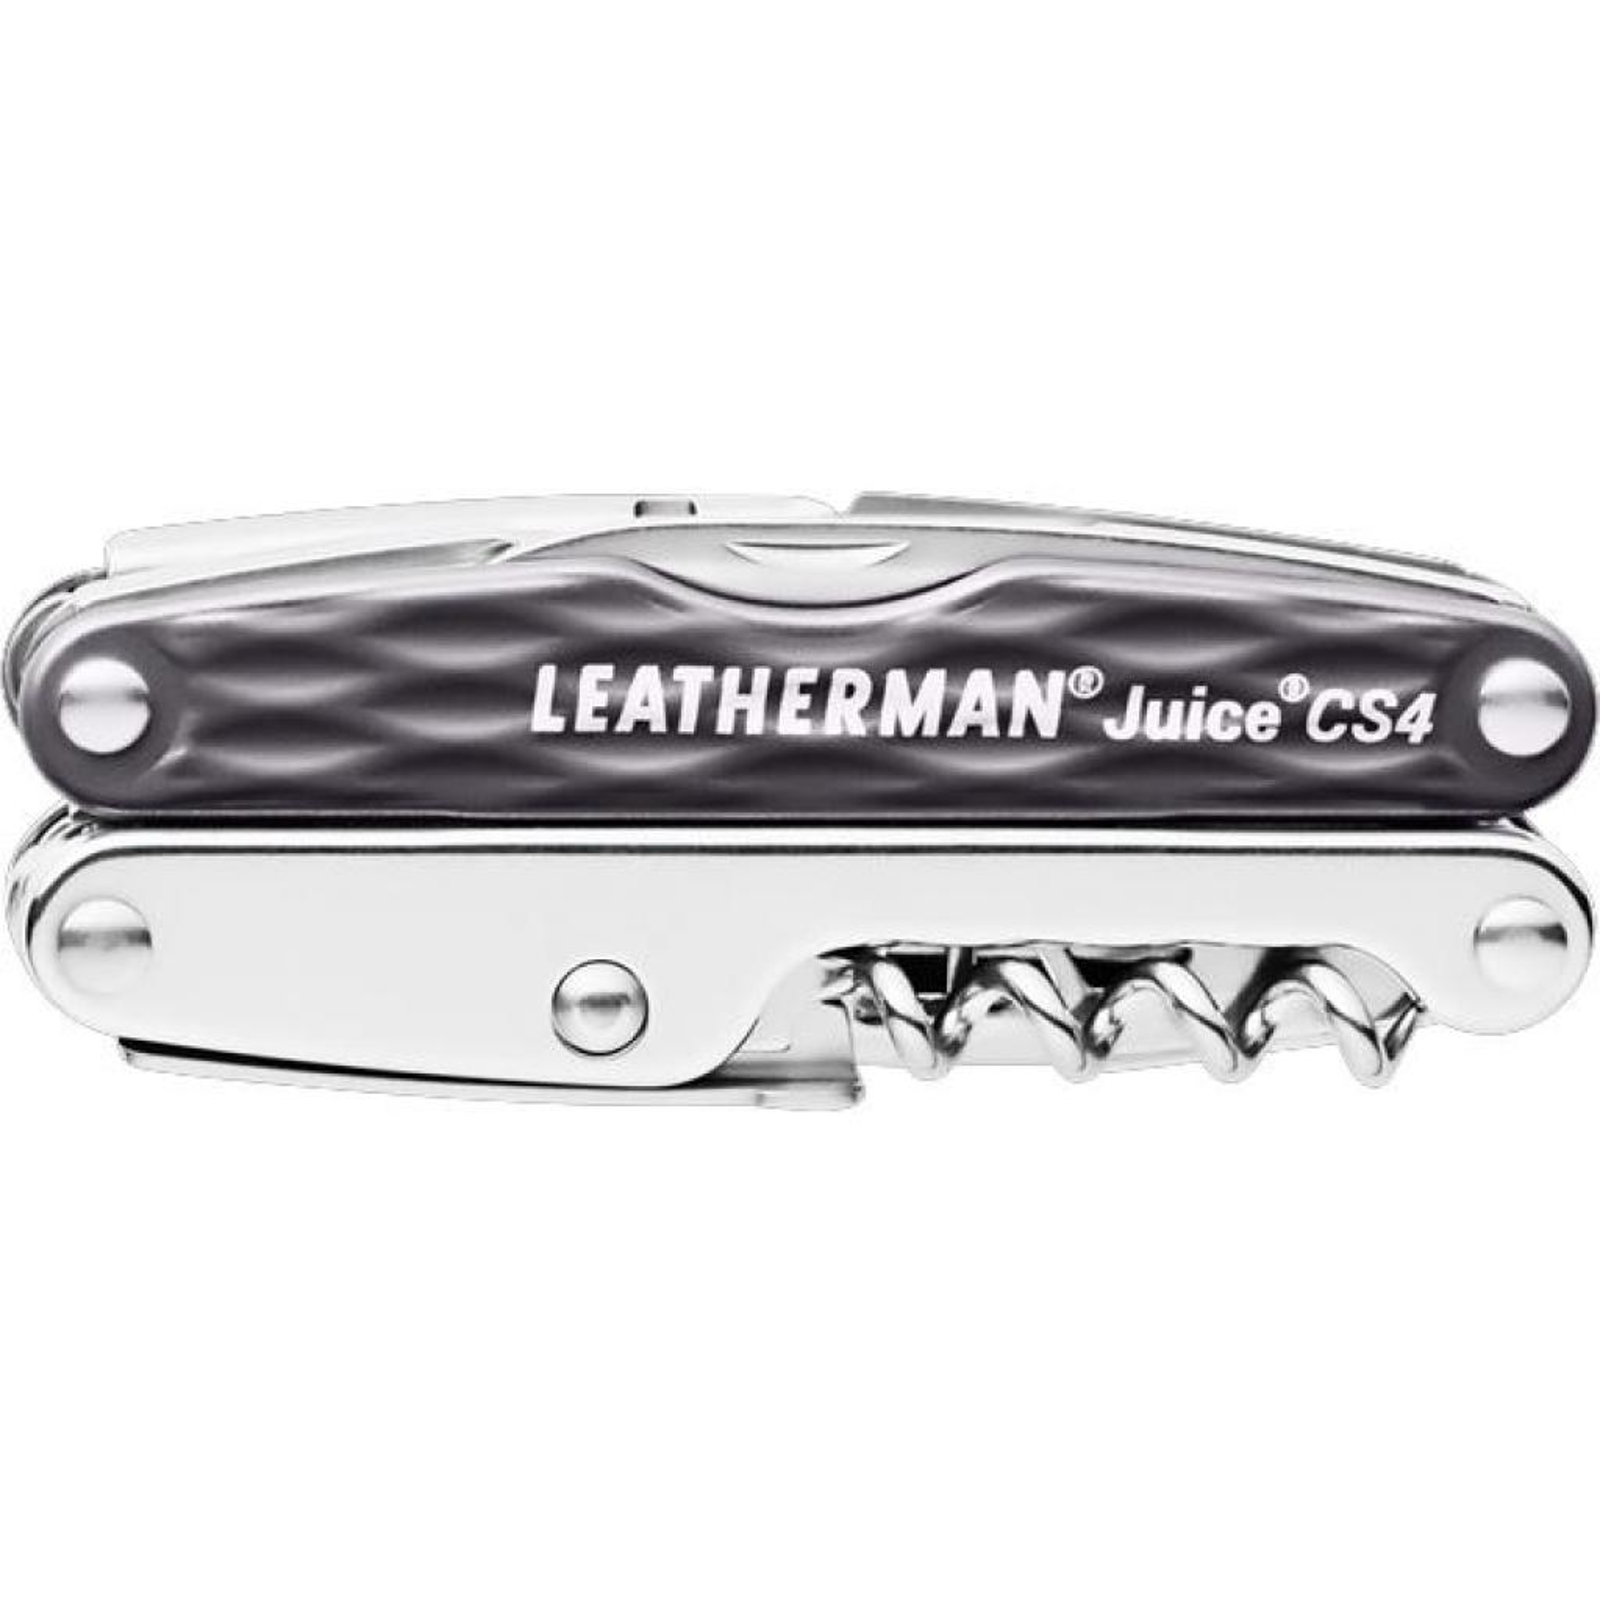 Мультитул Leatherman Juice CS4- GRANITE GRAY (831939) изображение 3